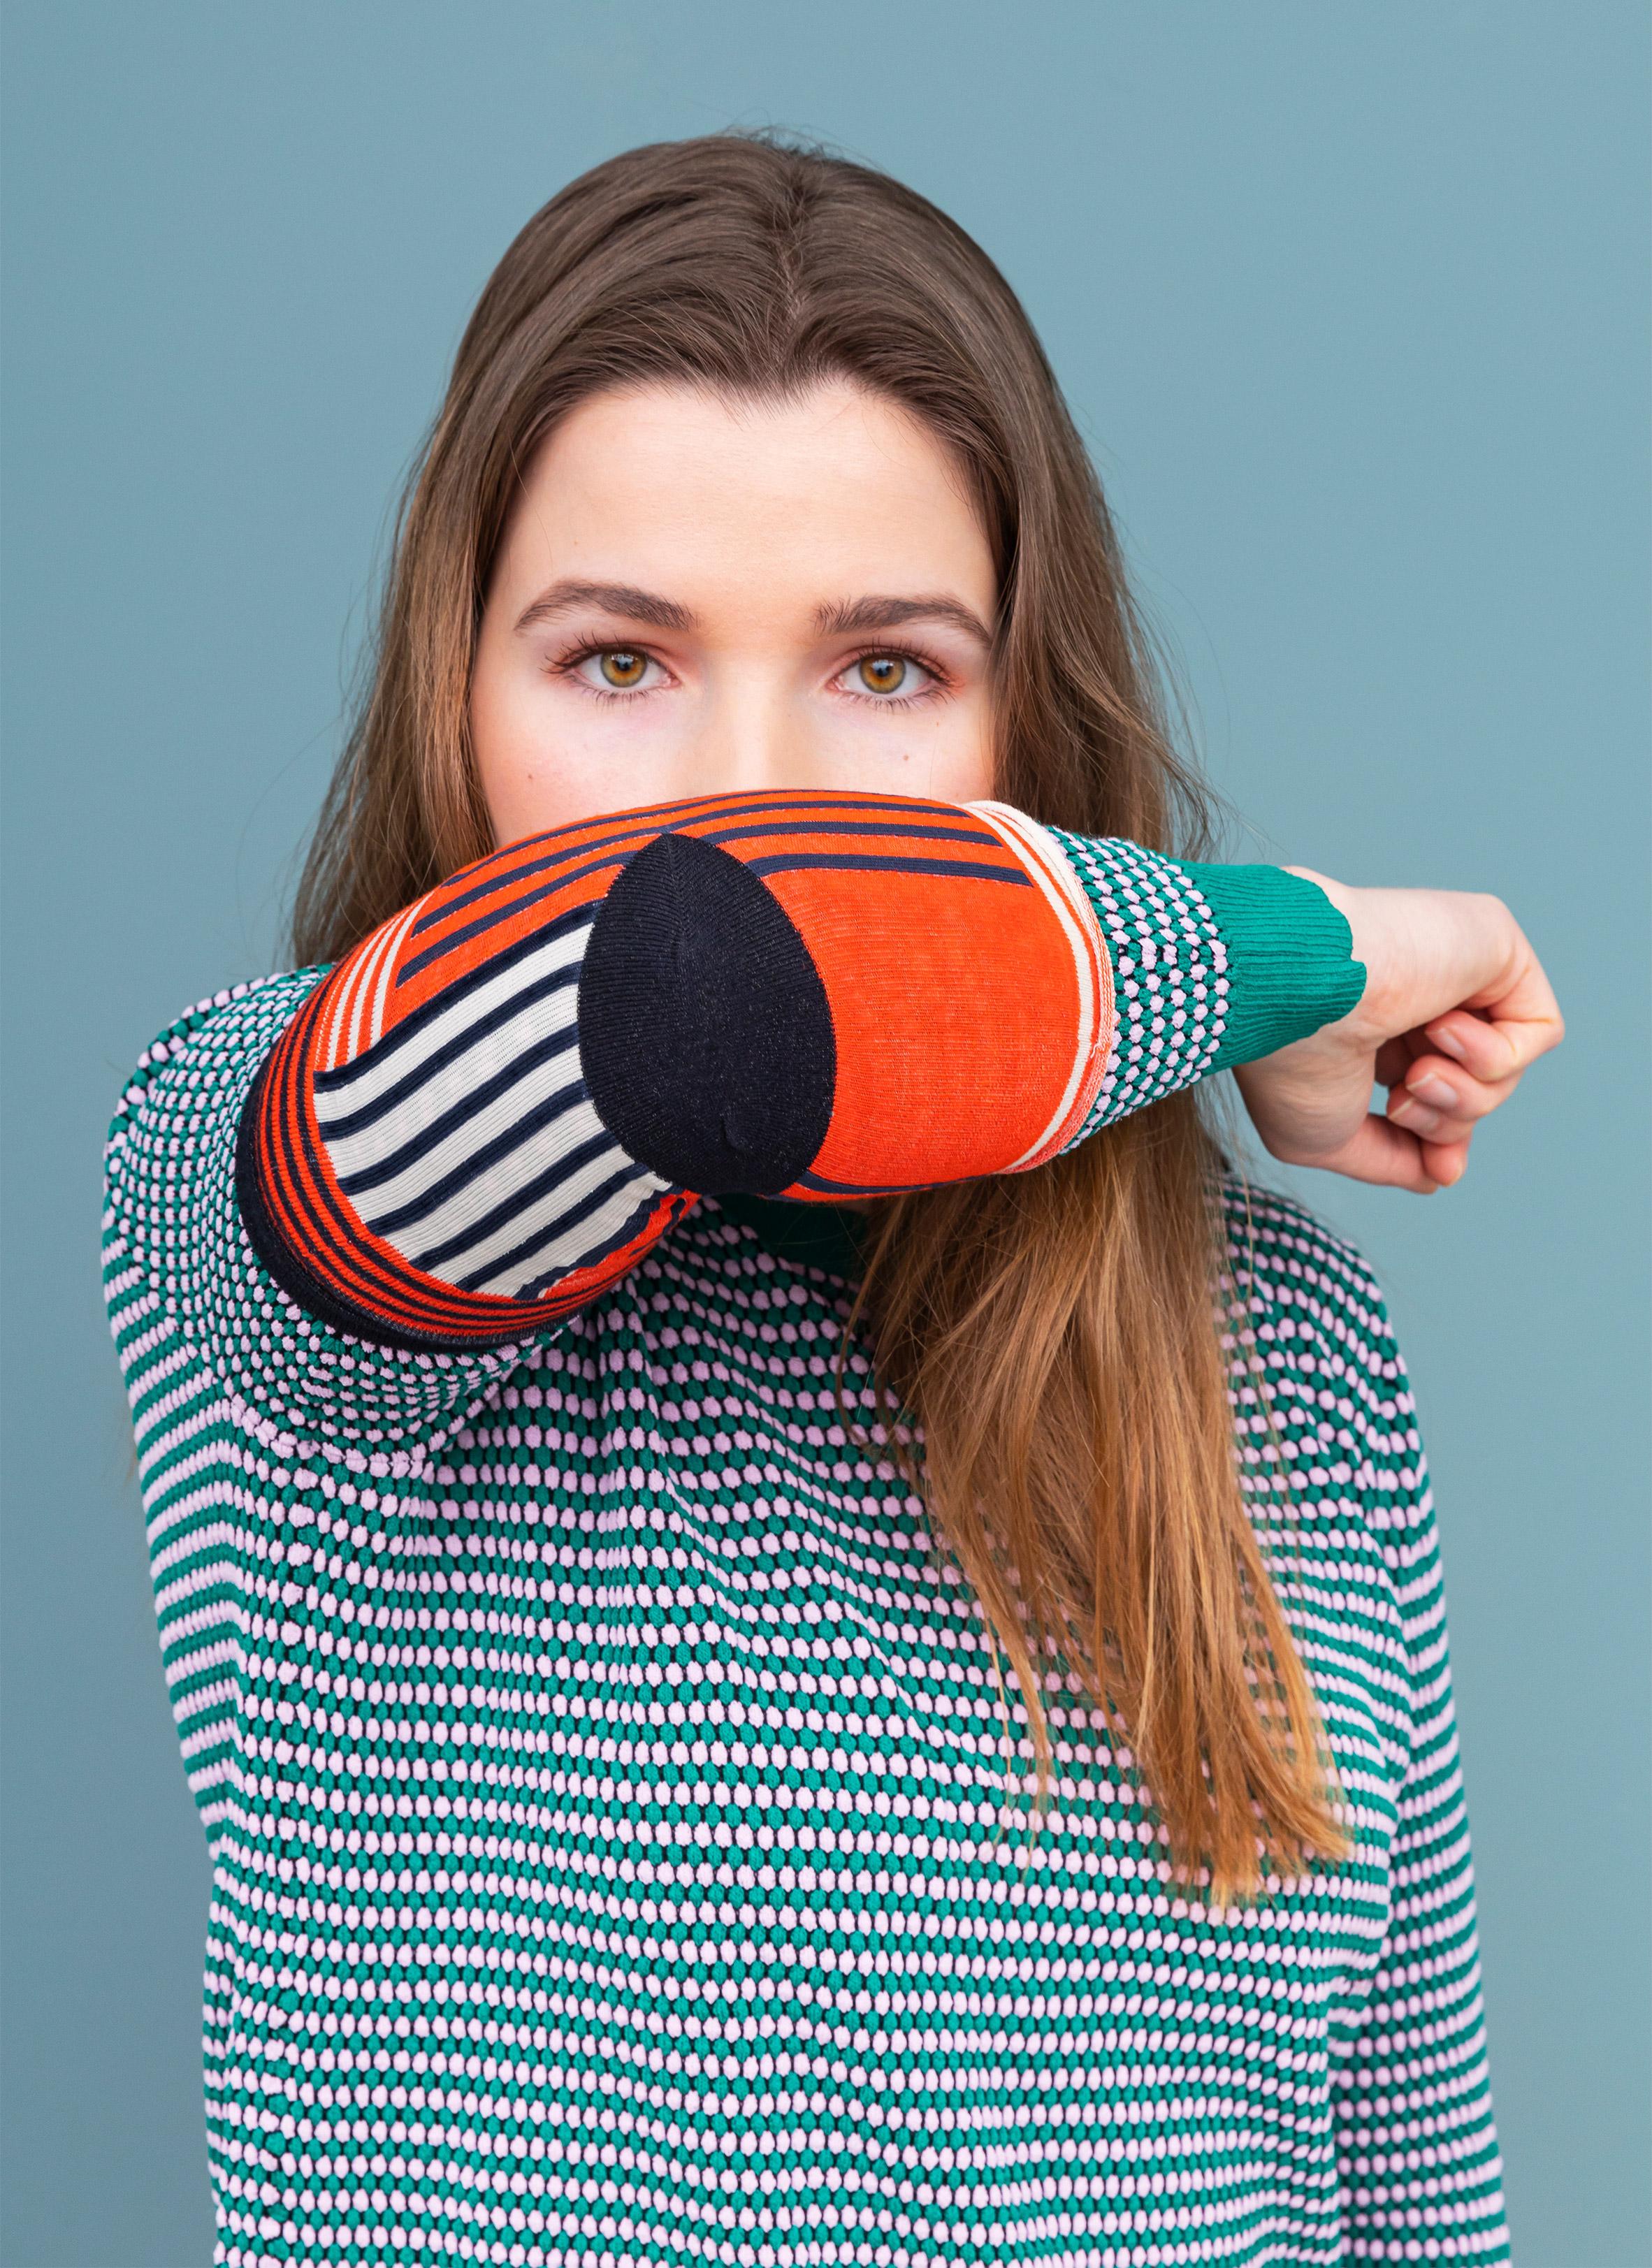 Elbow Sock for coronavirus by Raw Colour